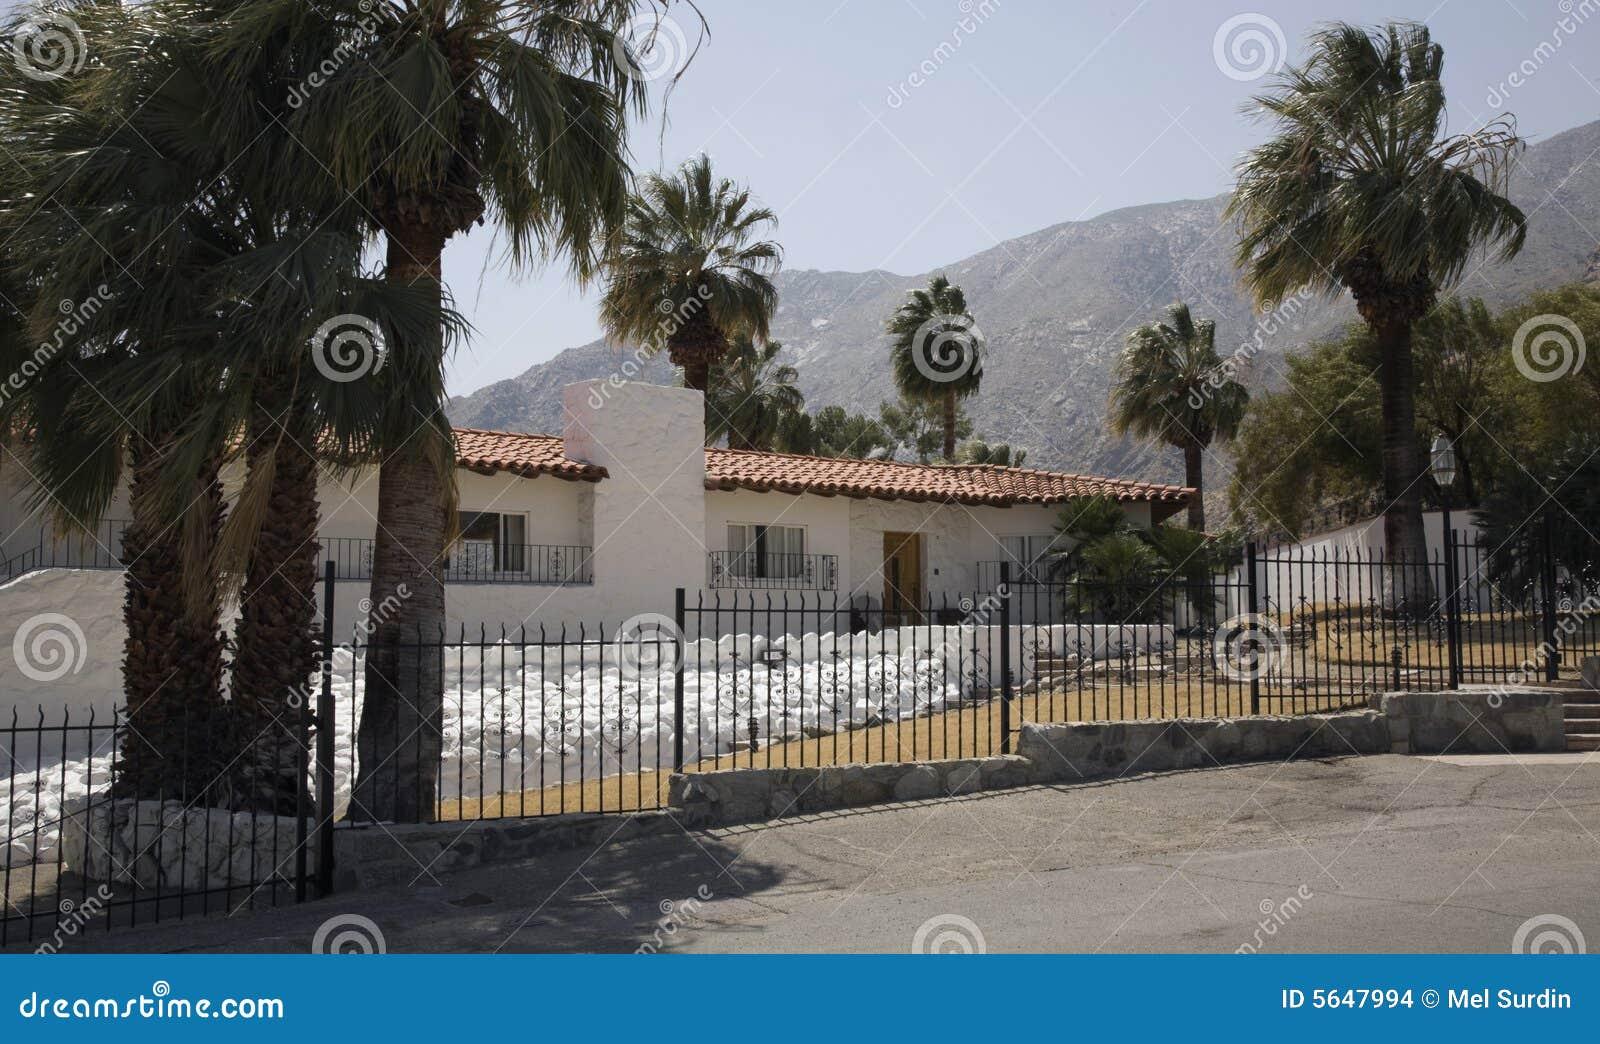 maison-d-elvis-presley-5647994 Palm Springs Home Plans on bakersfield home plan, florida home plan, texas home plan, altamonte home plan,